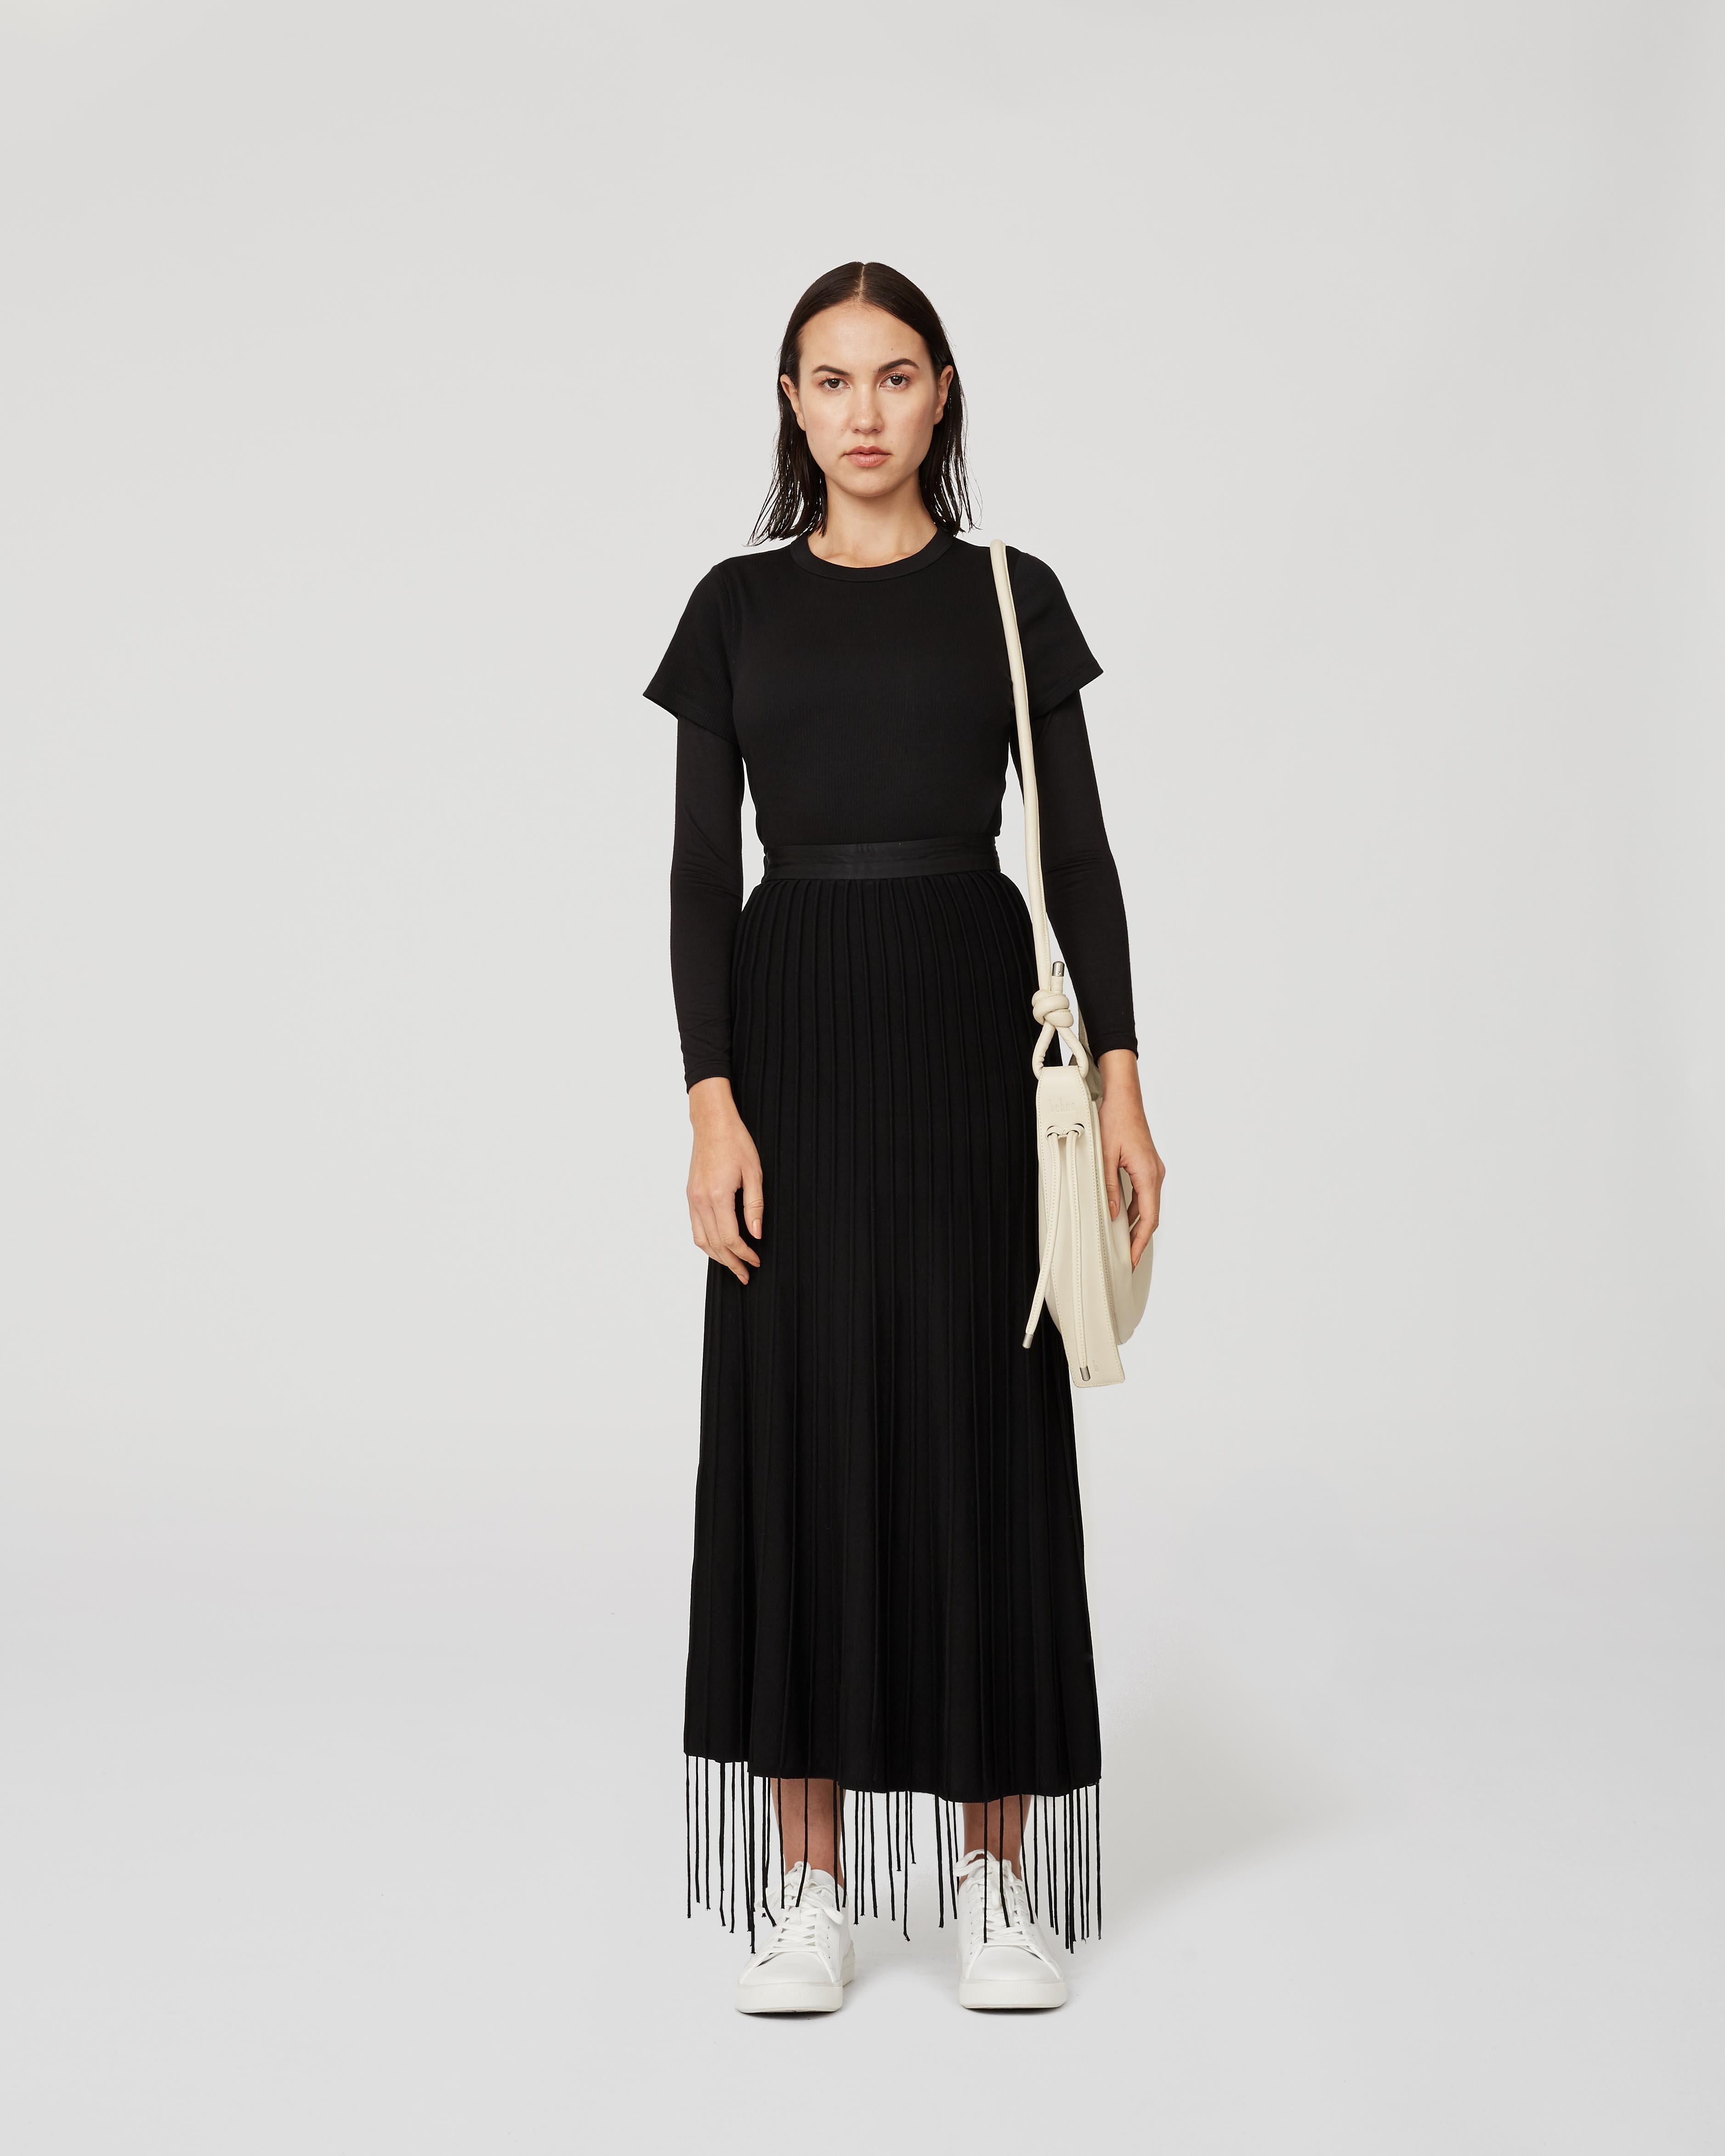 World Threads Traveler, Trusted Brands Women's Fashion Behno